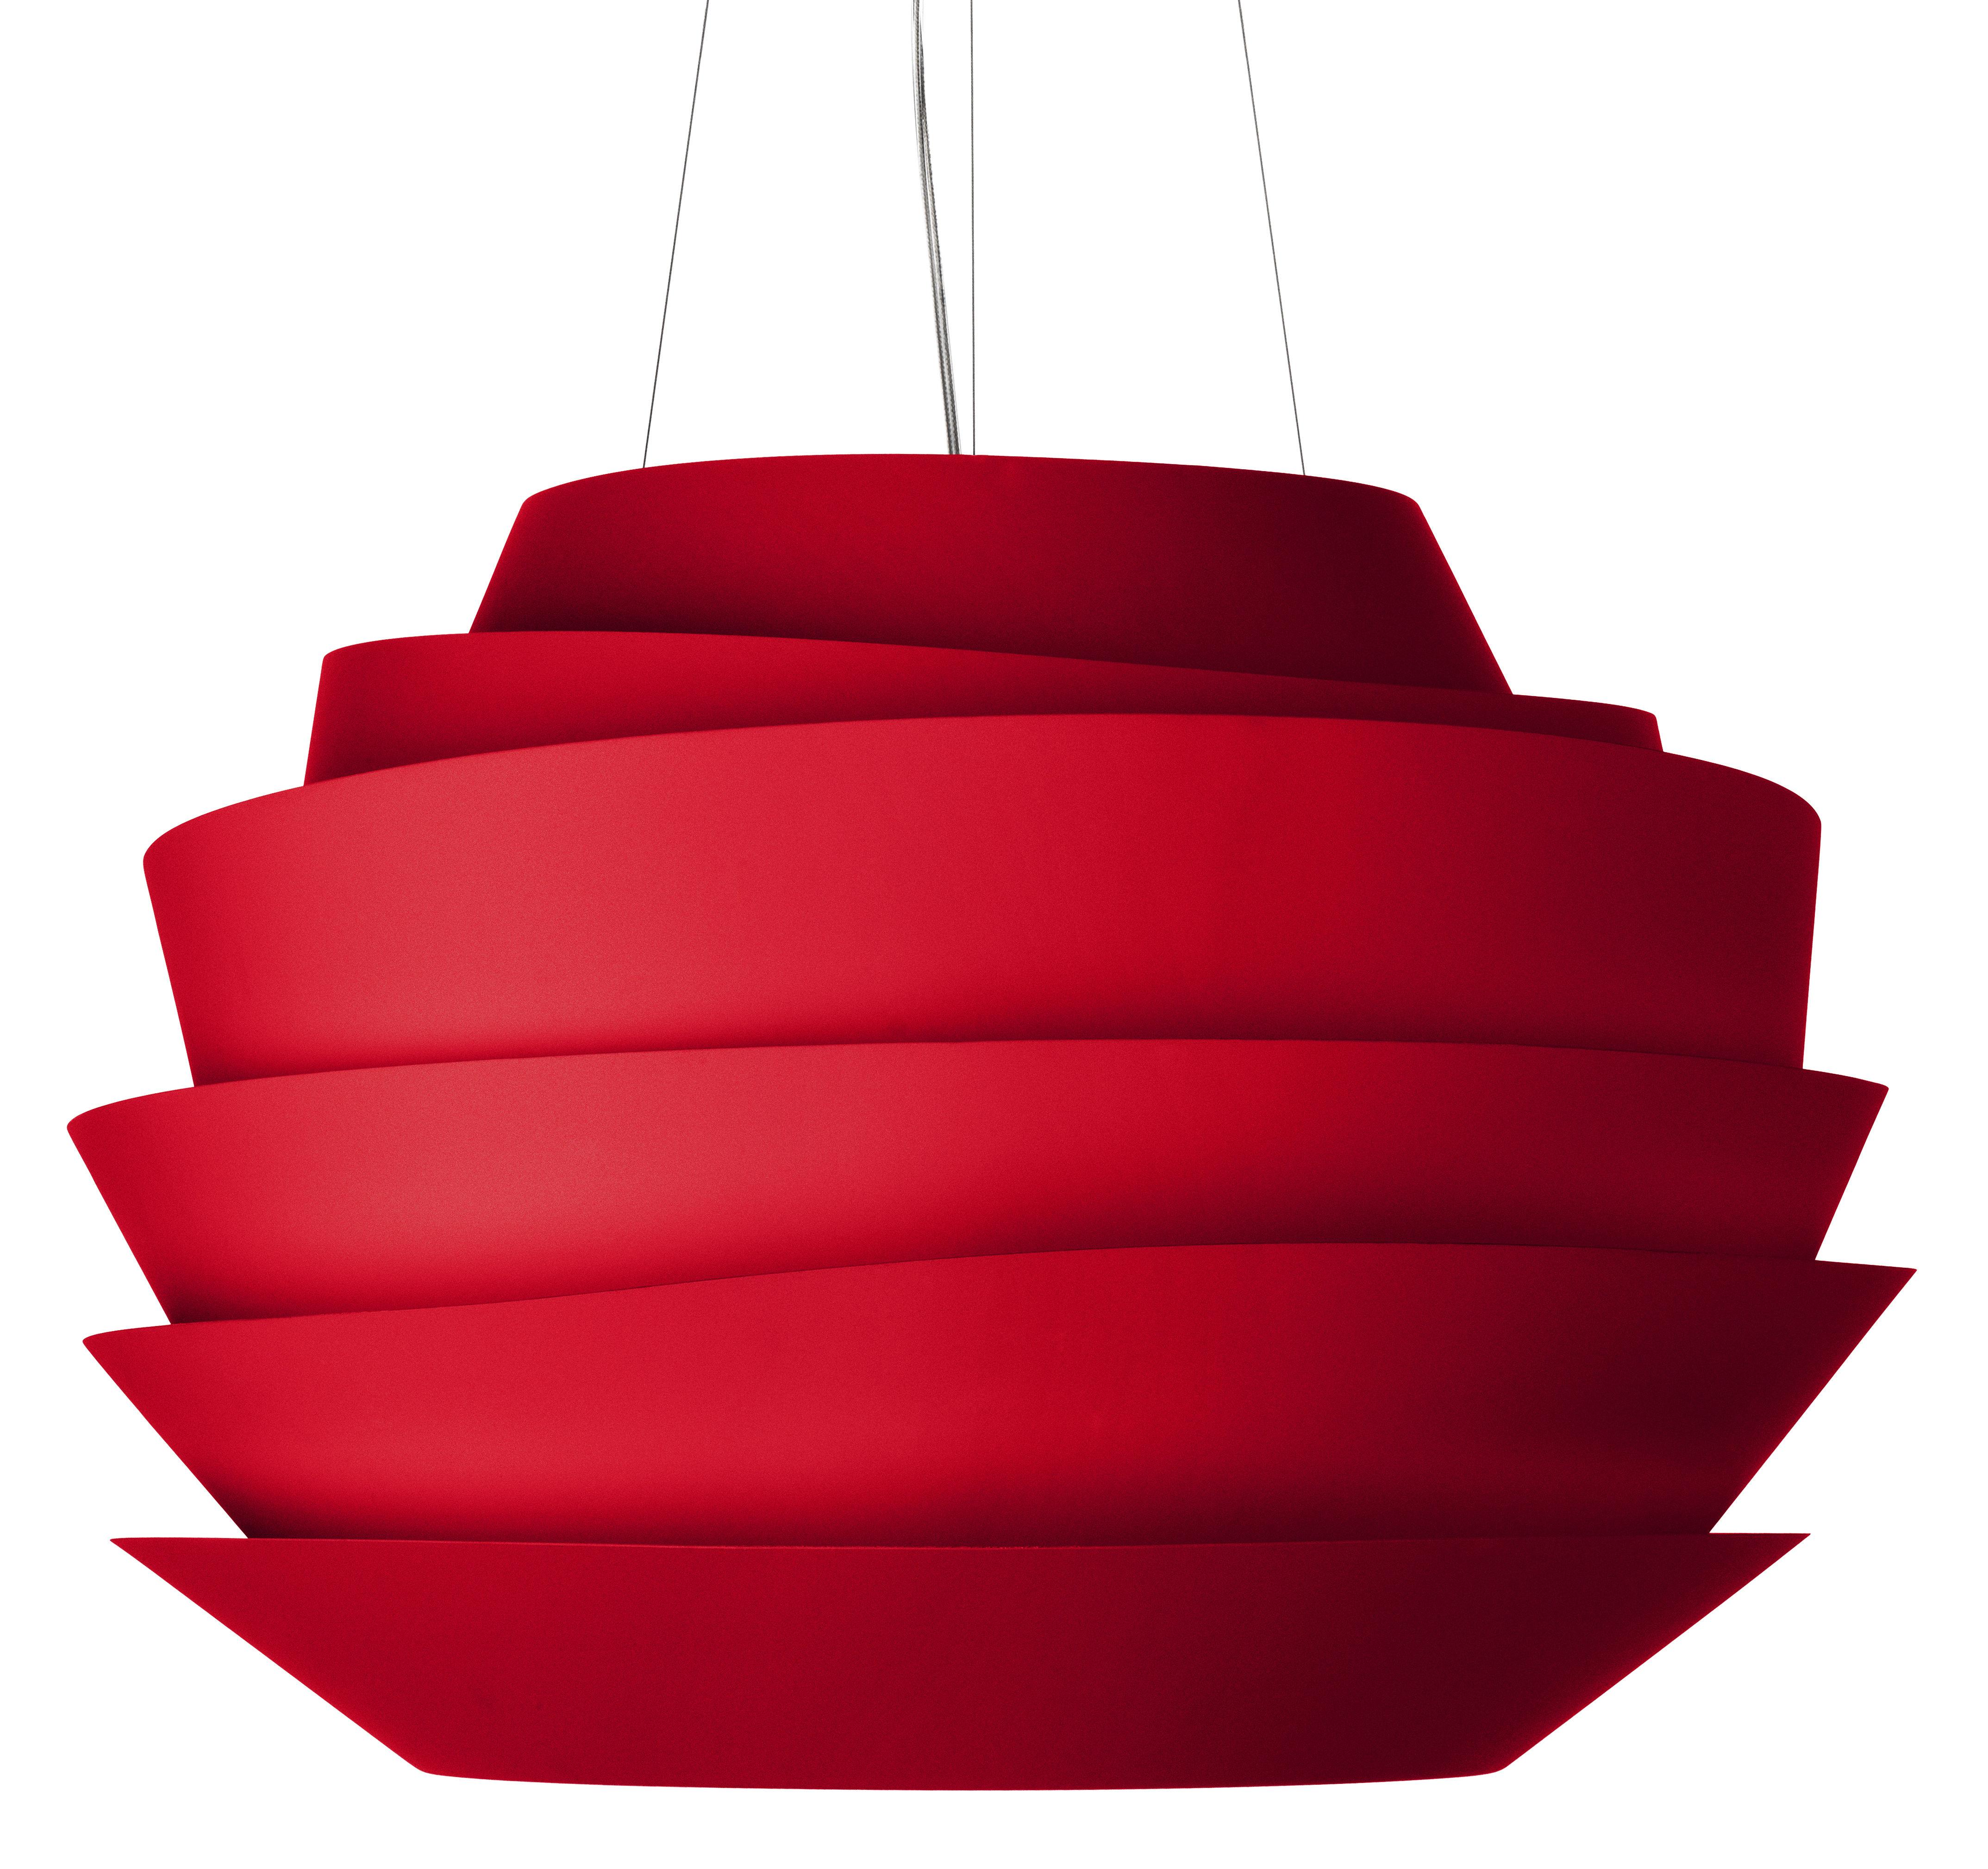 Lighting - Pendant Lighting - Le soleil Pendant by Foscarini - Red - Polycarbonate